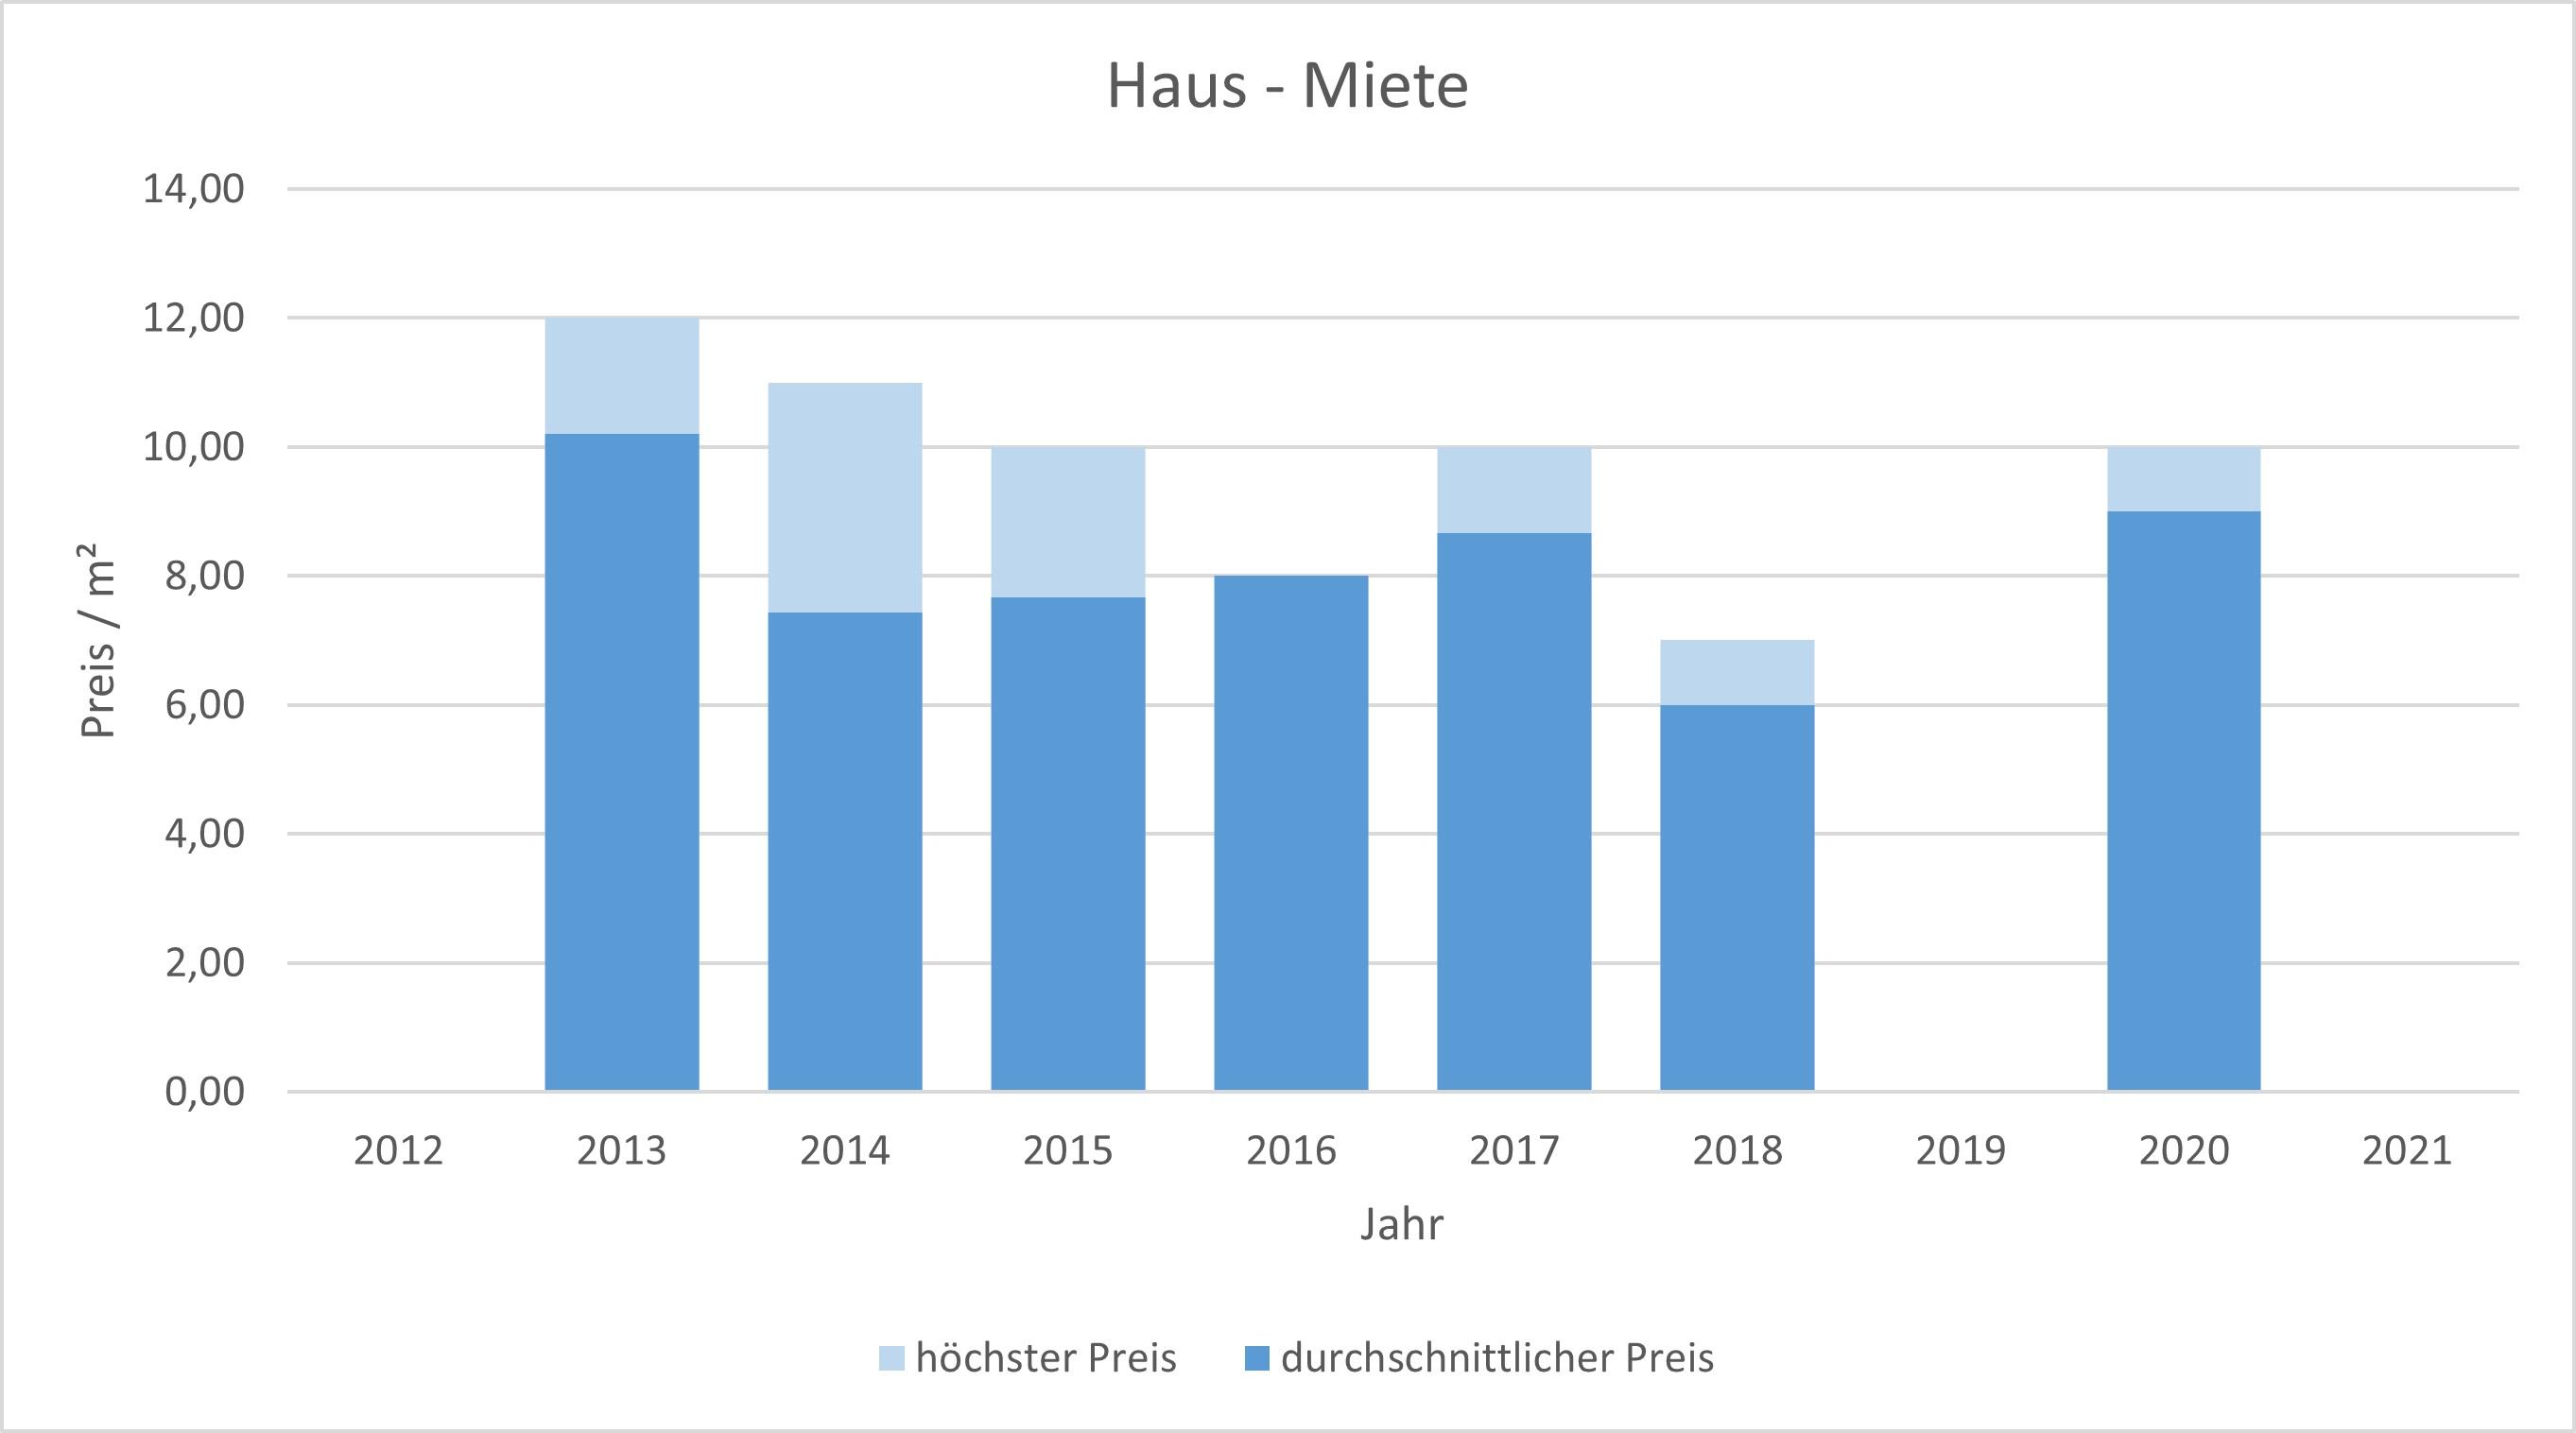 Bayrischzell makler haus mieten vermieten preis bewertung www.happy-immo.de 2019, 2020, 2021